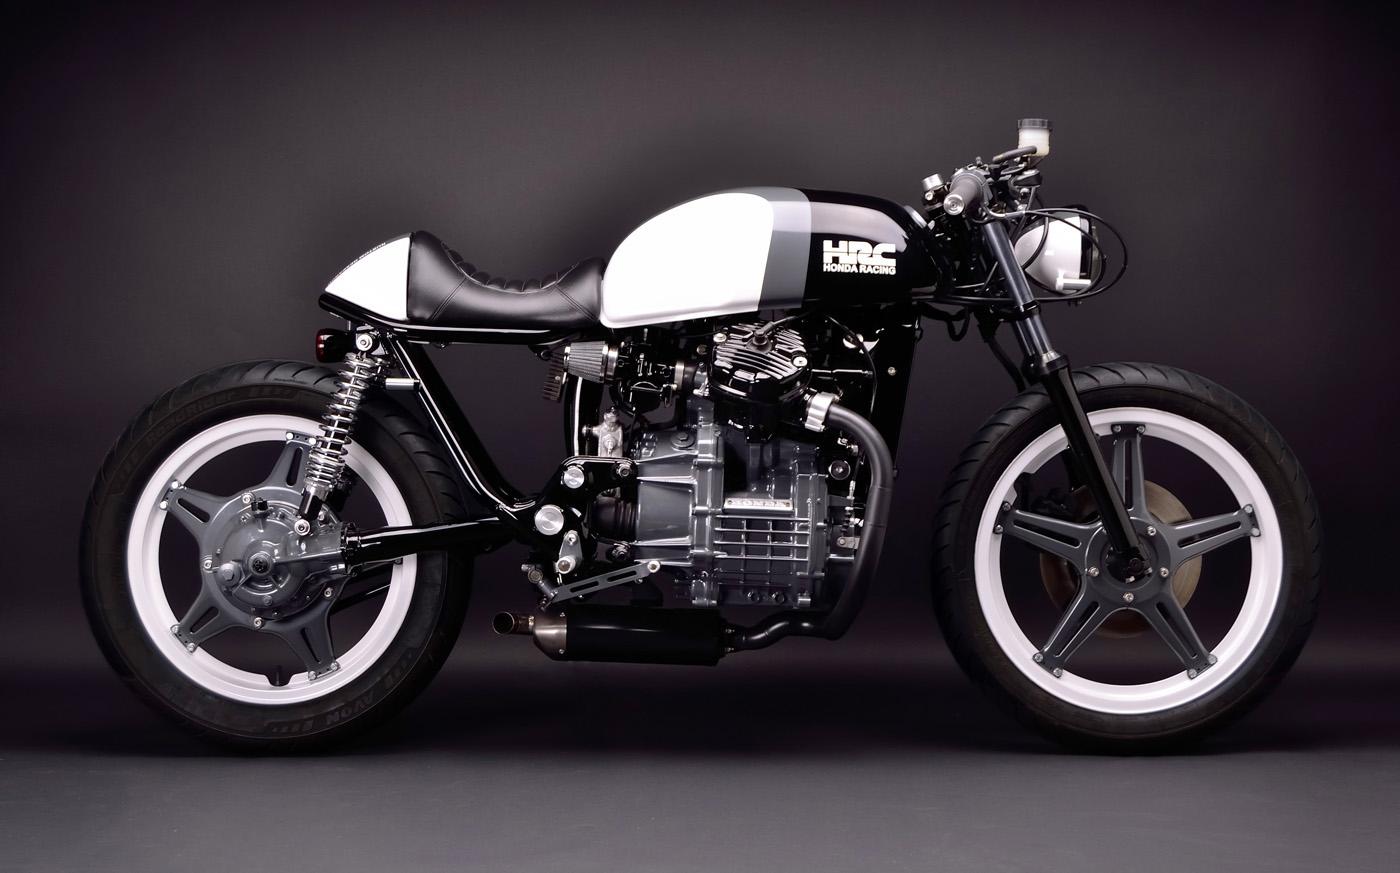 Custom Honda Cx500 Cafe Racer Motorcycle Build Vintage Bike Cx 500